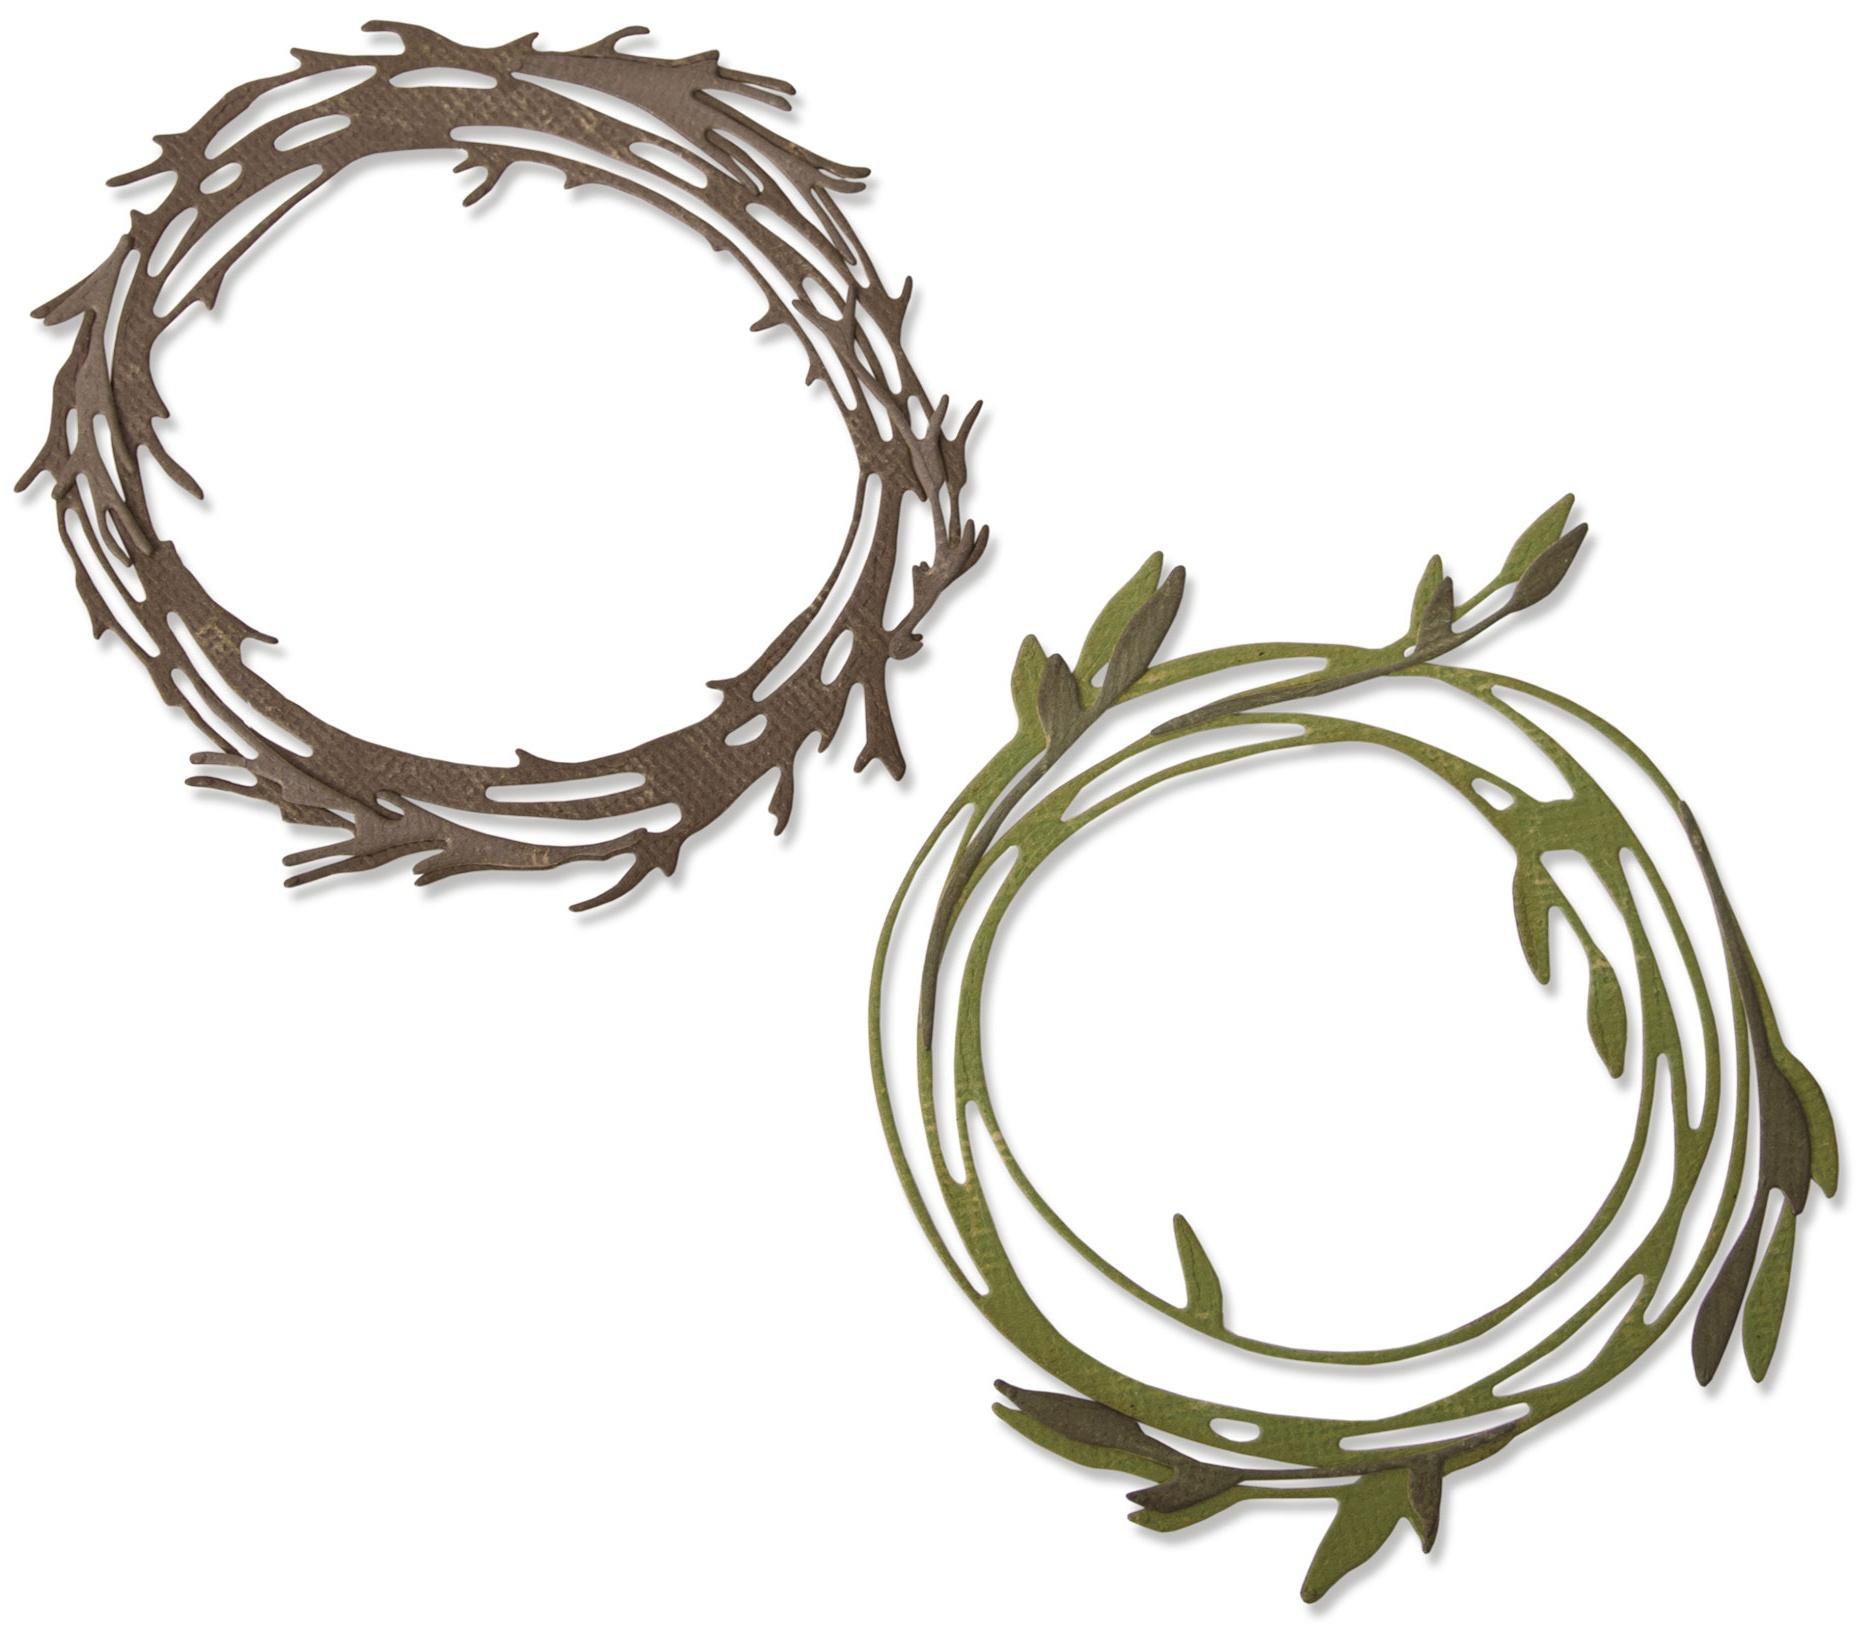 Sizzix Thinlits Dies By Tim Holtz-Funky Wreath